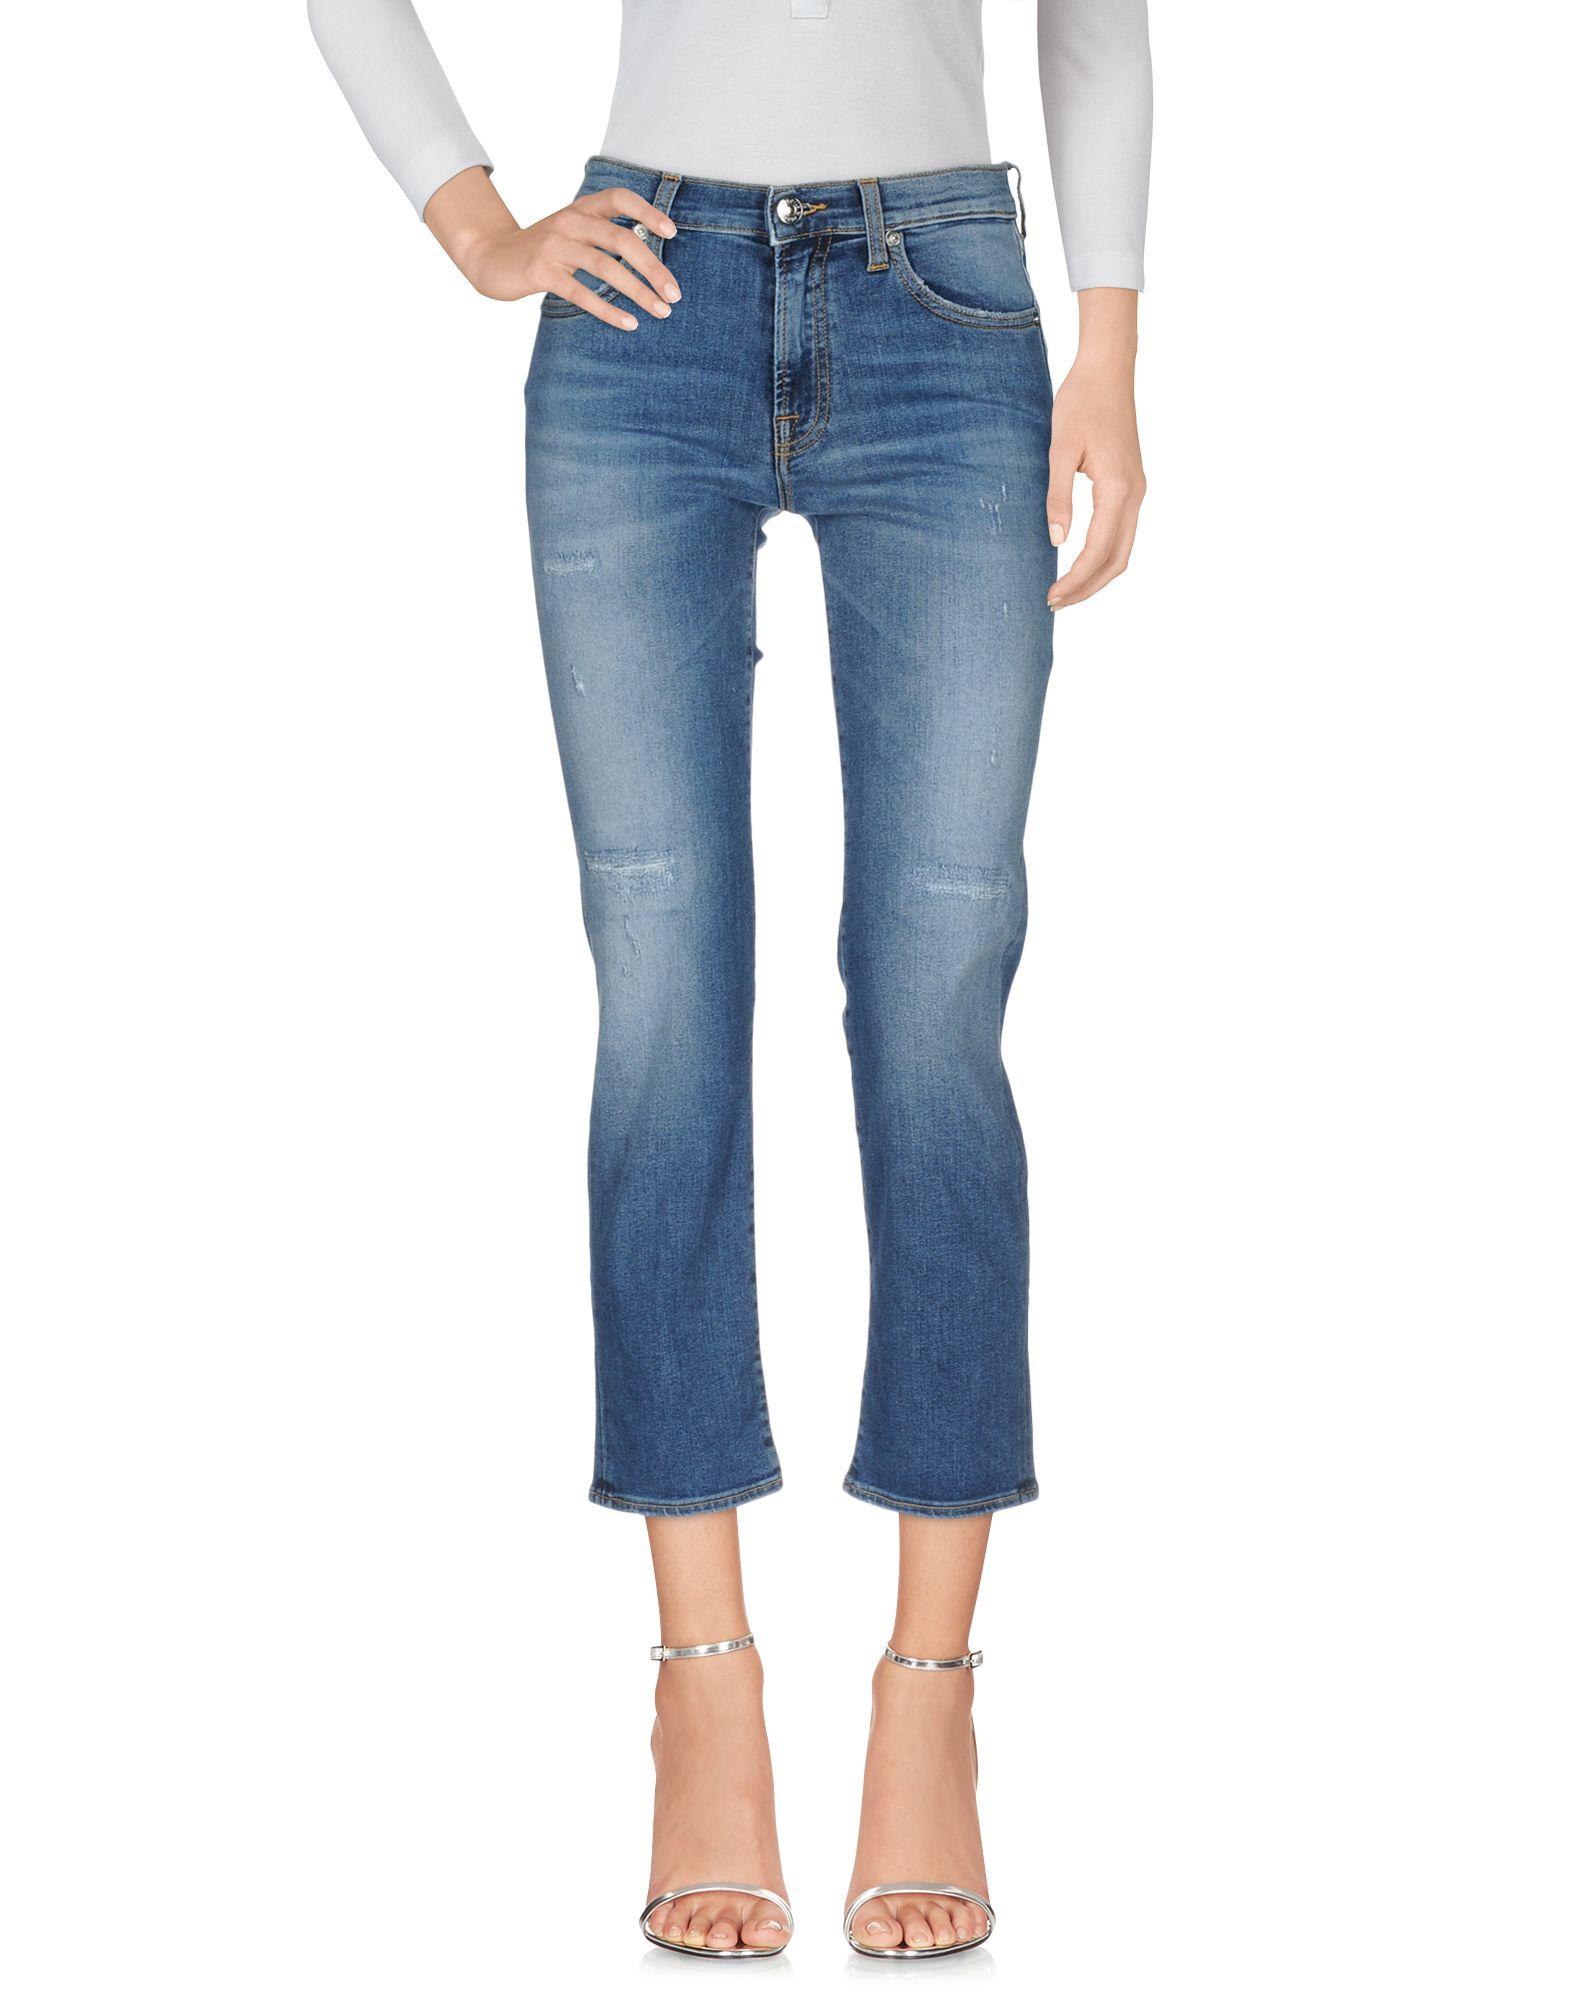 Pantaloni Jeans (+) People Donna - Acquista online su Bn41nCIPl7